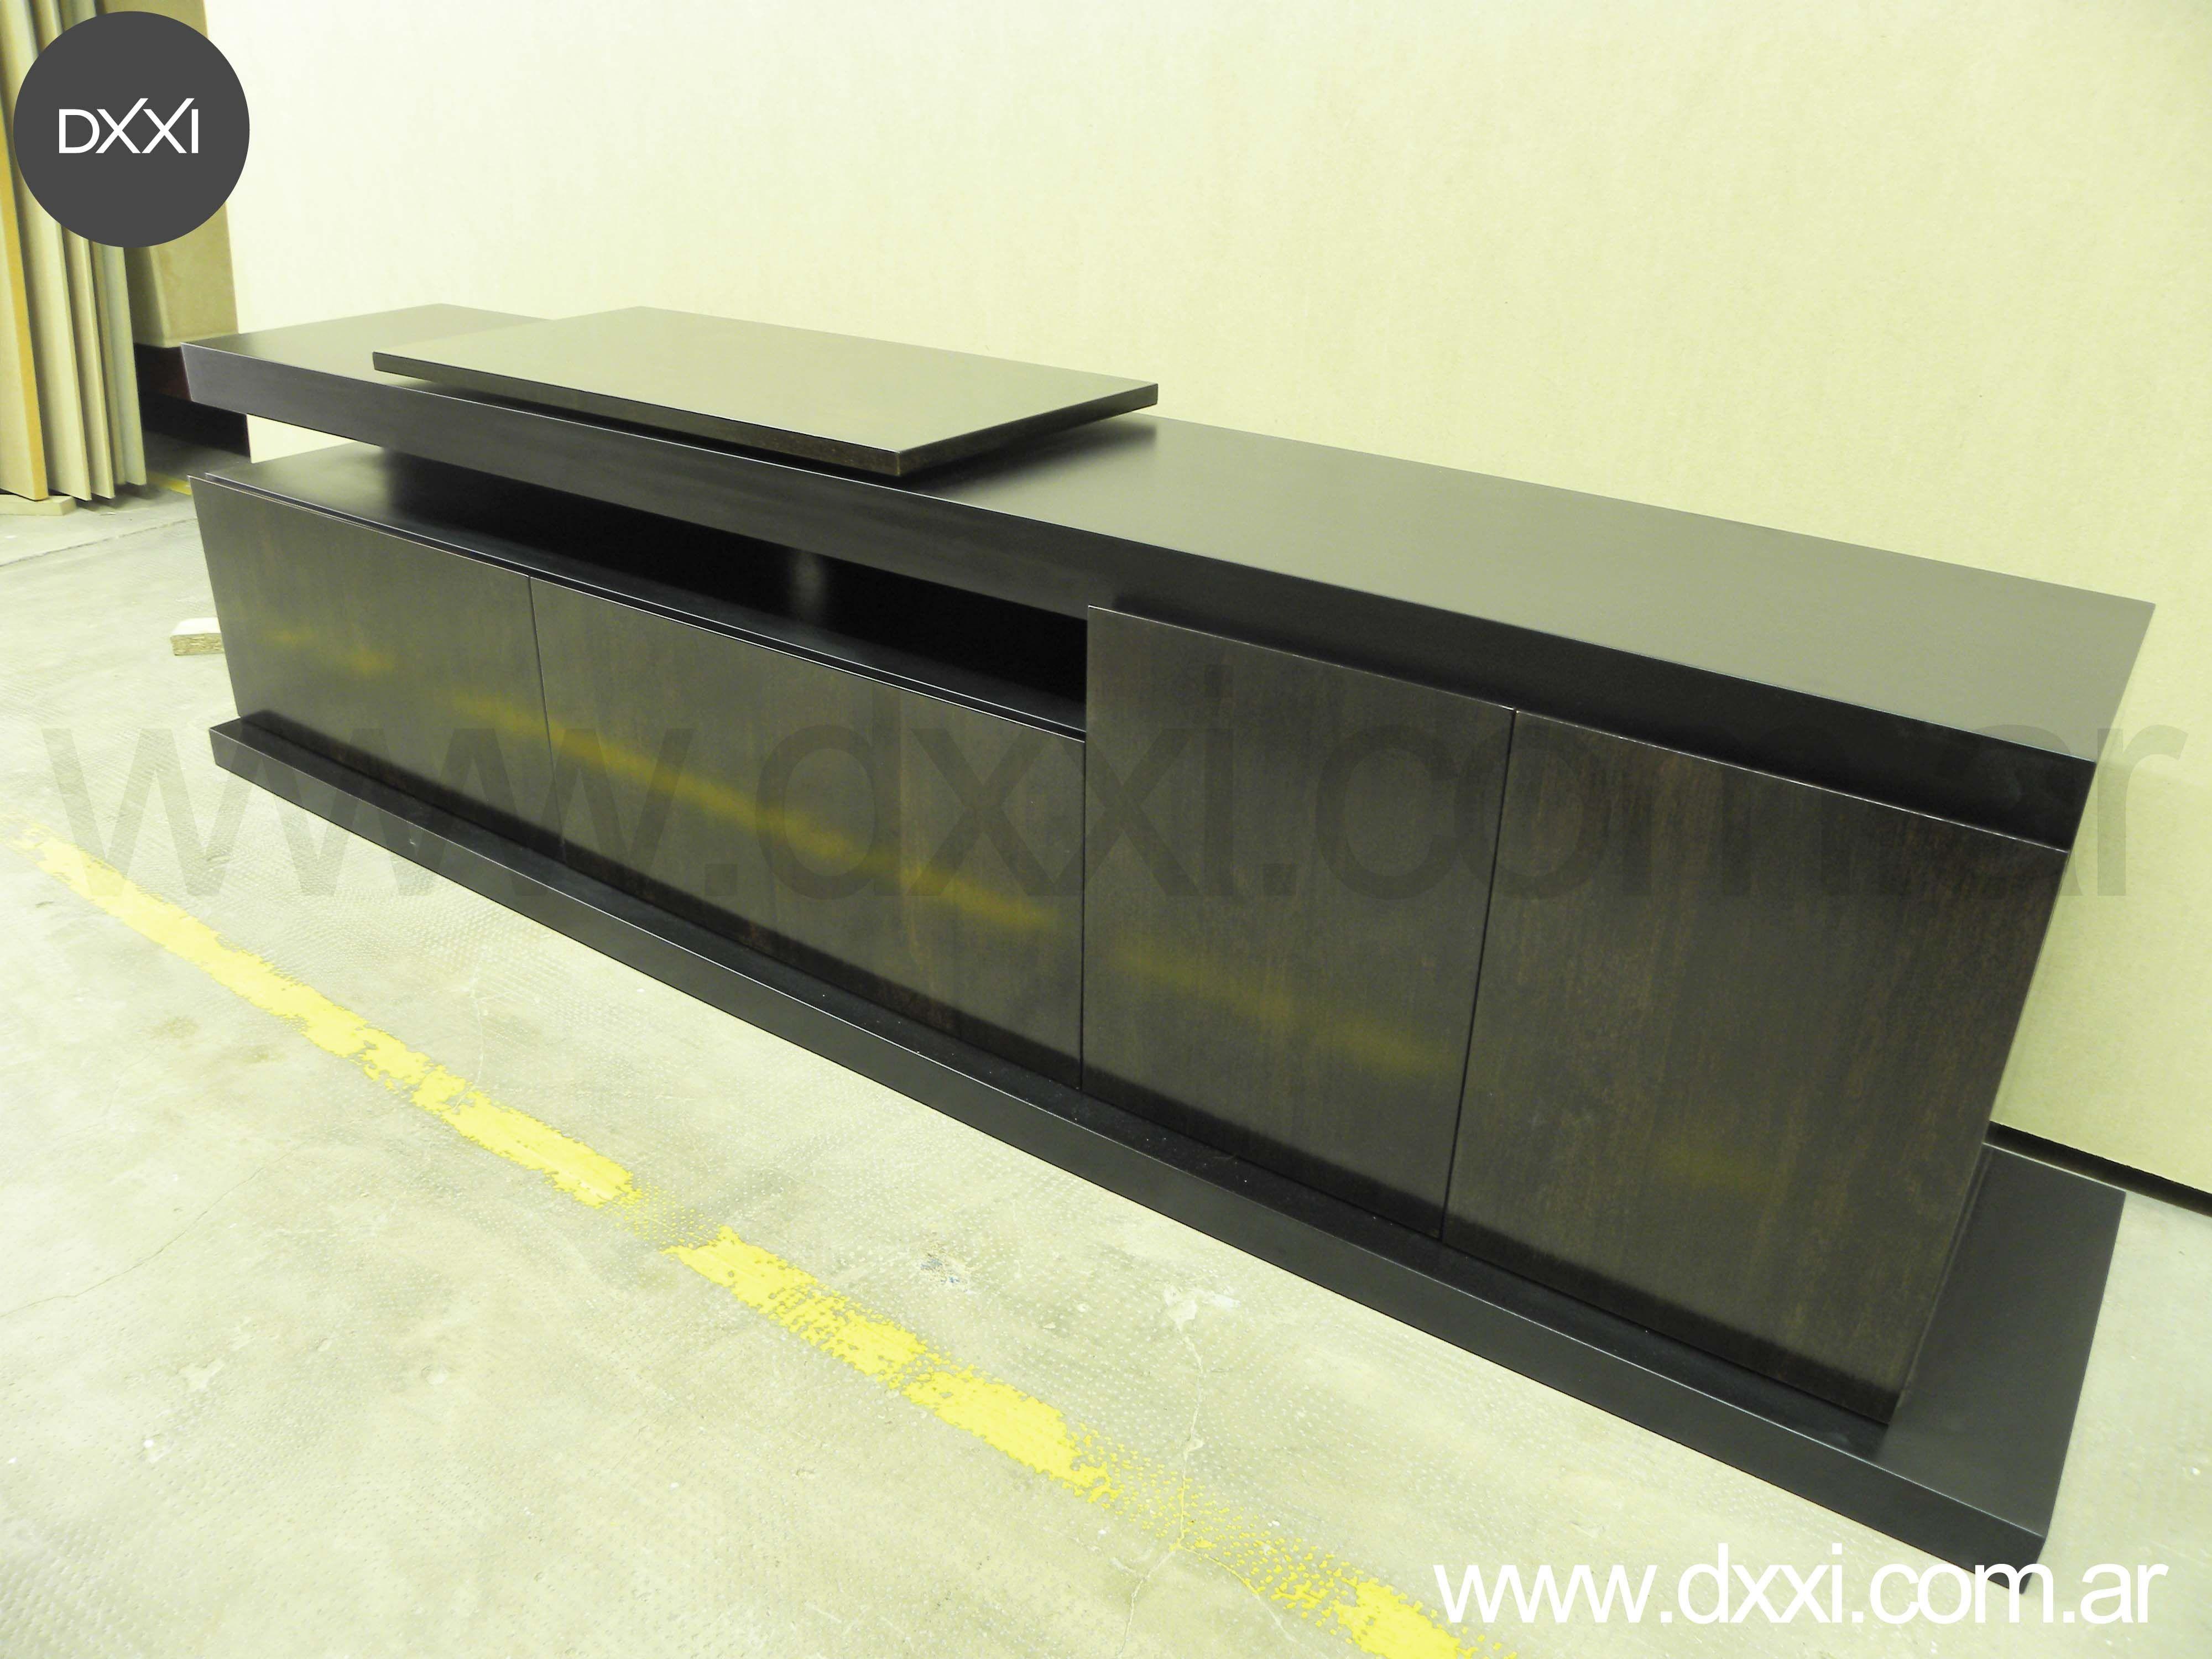 Mueble Para Tv Modelo Florida Con Plato Giratorio 220x40x55 2  # Muebles Nicasio Orono